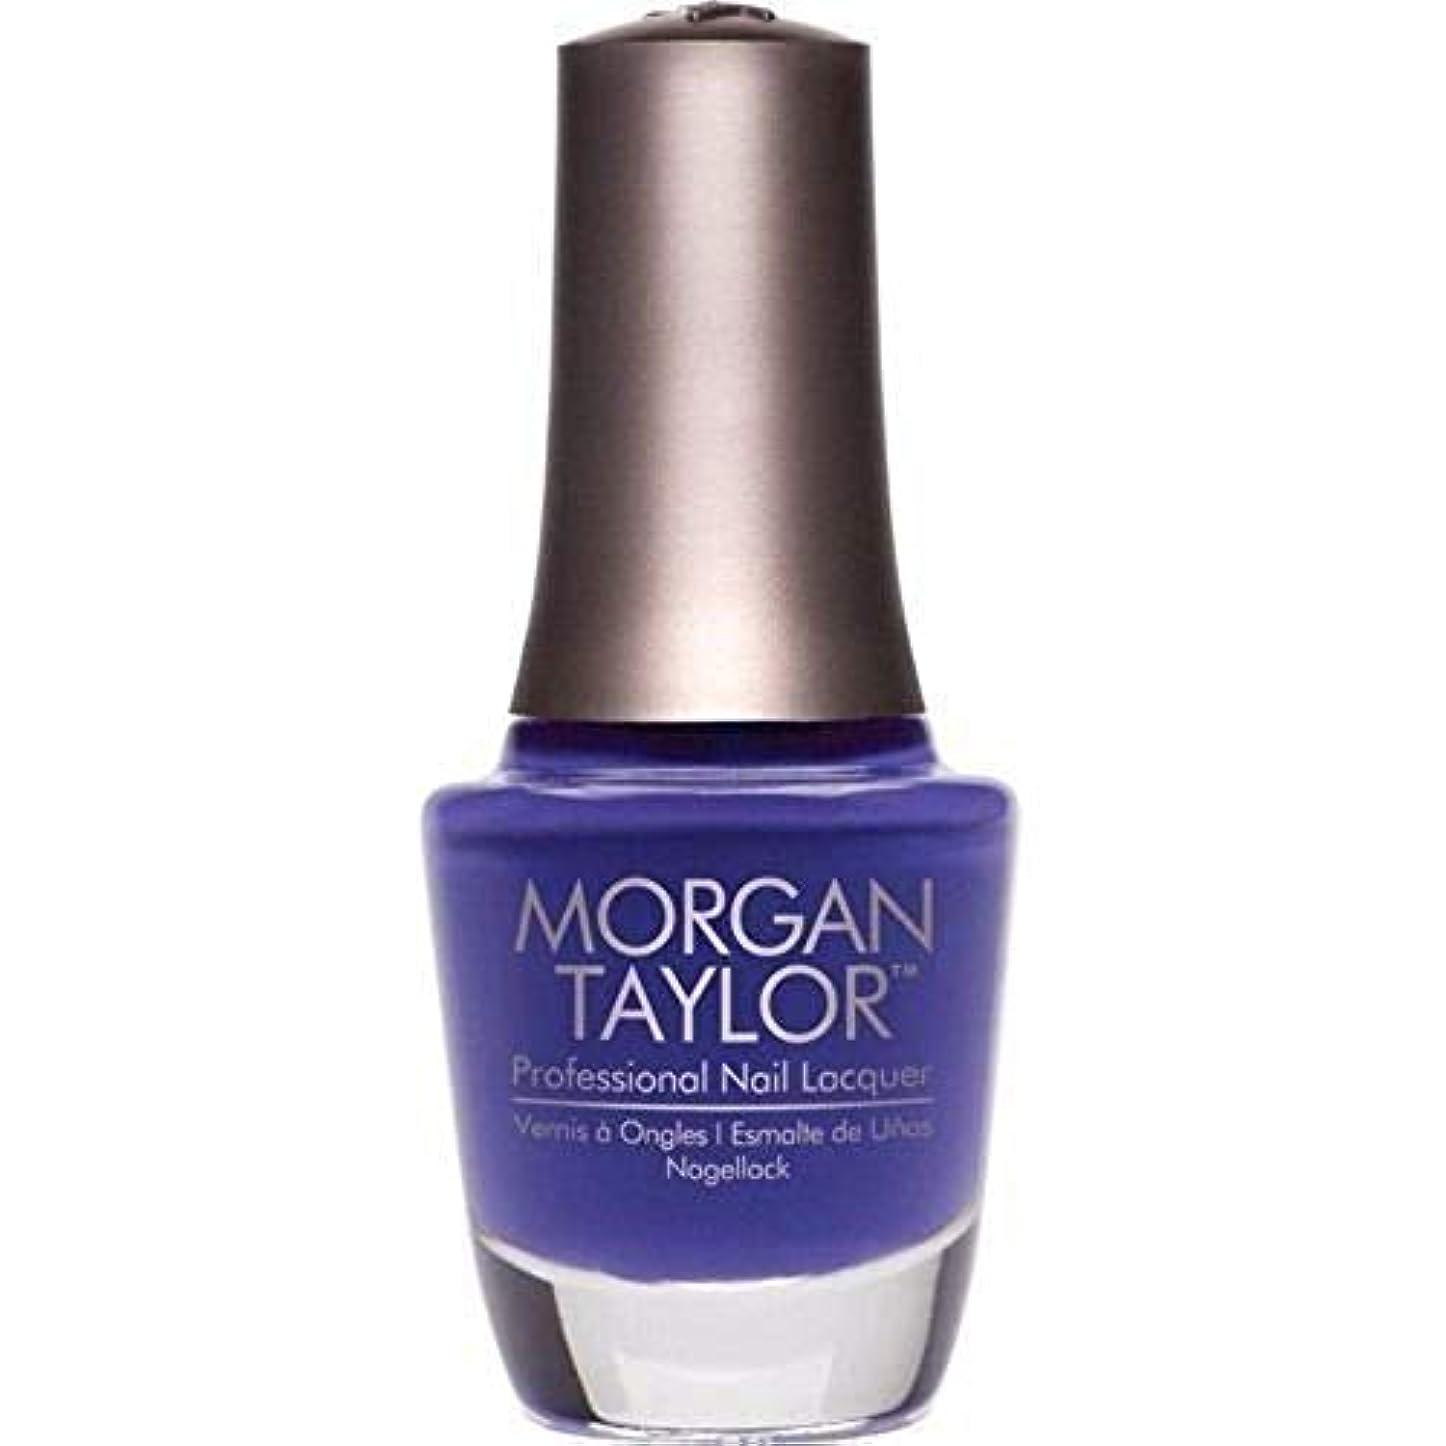 Morgan Taylor - Professional Nail Lacquer - Anime-zing Color! - 15 mL / 0.5oz